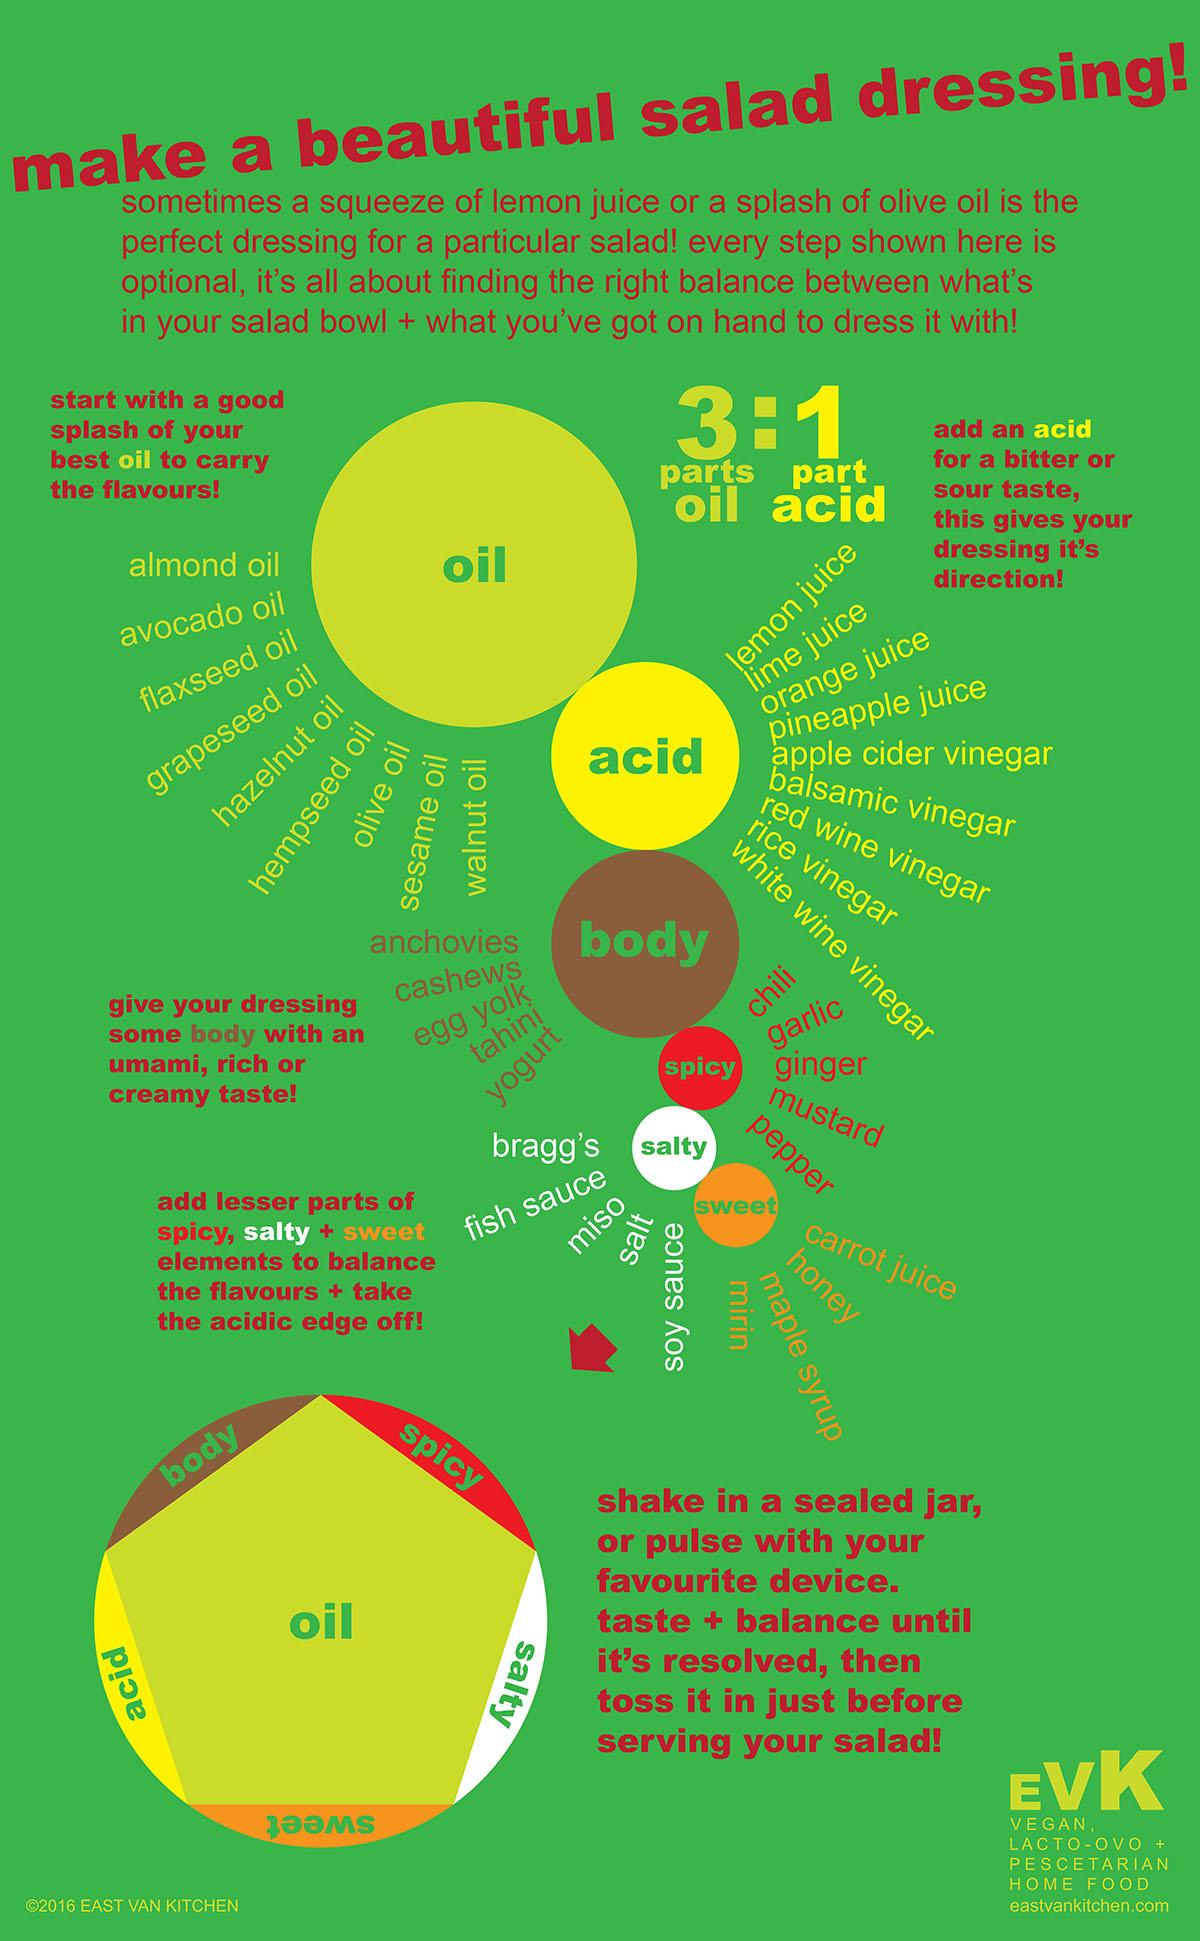 East Van Kitchen's formula for successful salad dressings!